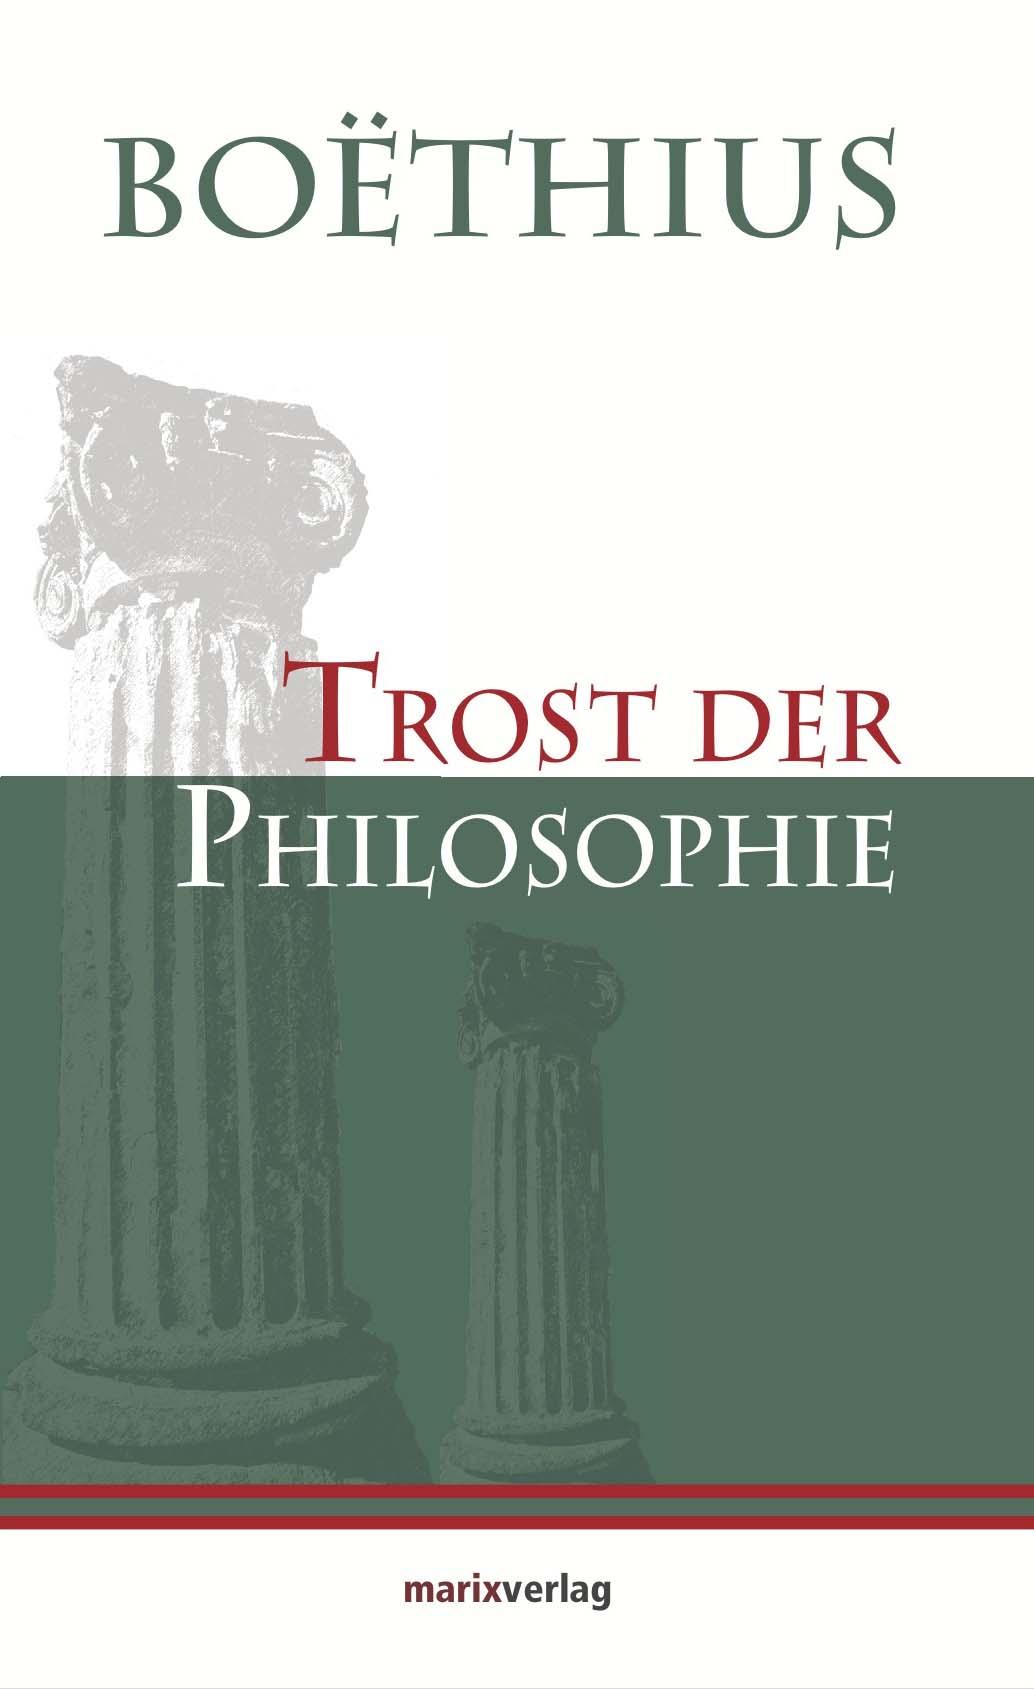 Boethius Trost der Philosophie edit trost adolph menzel